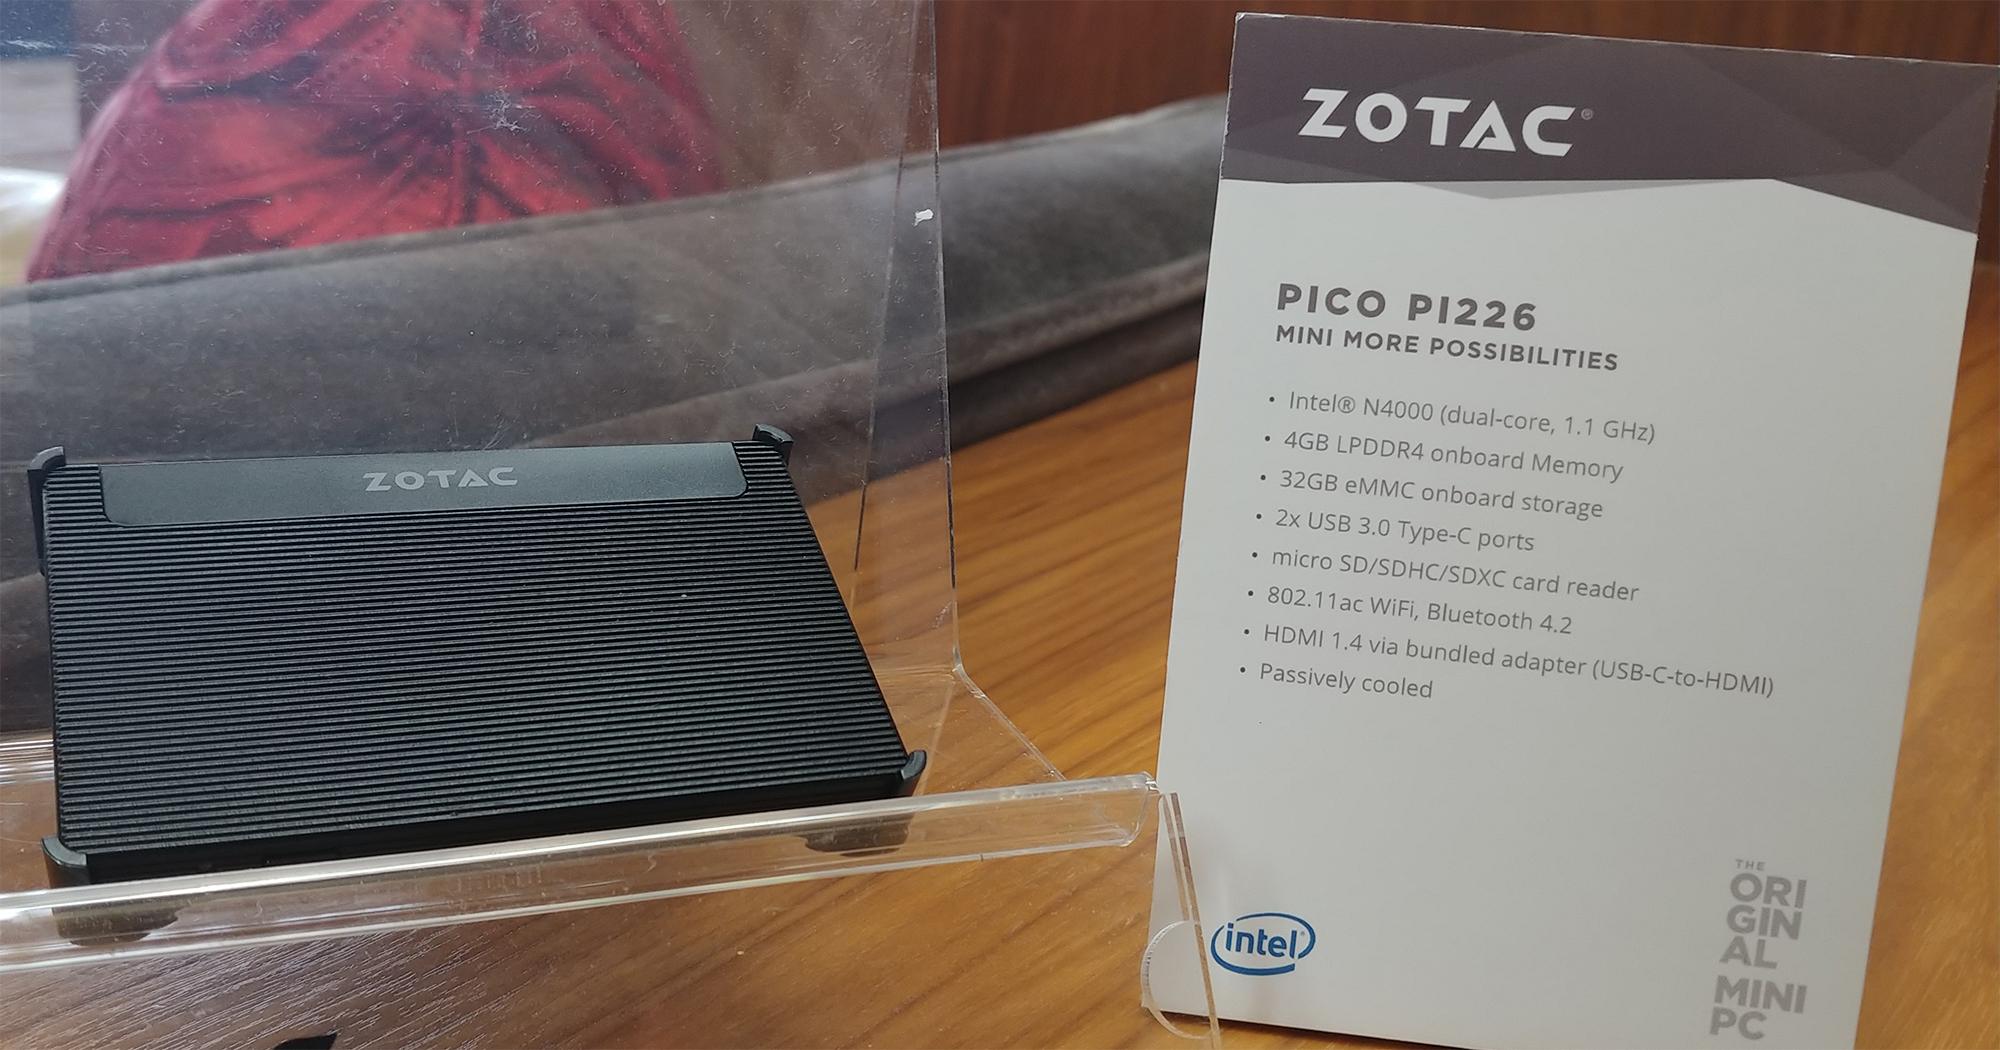 Zotac At Ces 2018 Gemini Lake Credit Card Pico Pcs V Gen Sdhc 4gb Zbox Pi226 A Sized Desktop